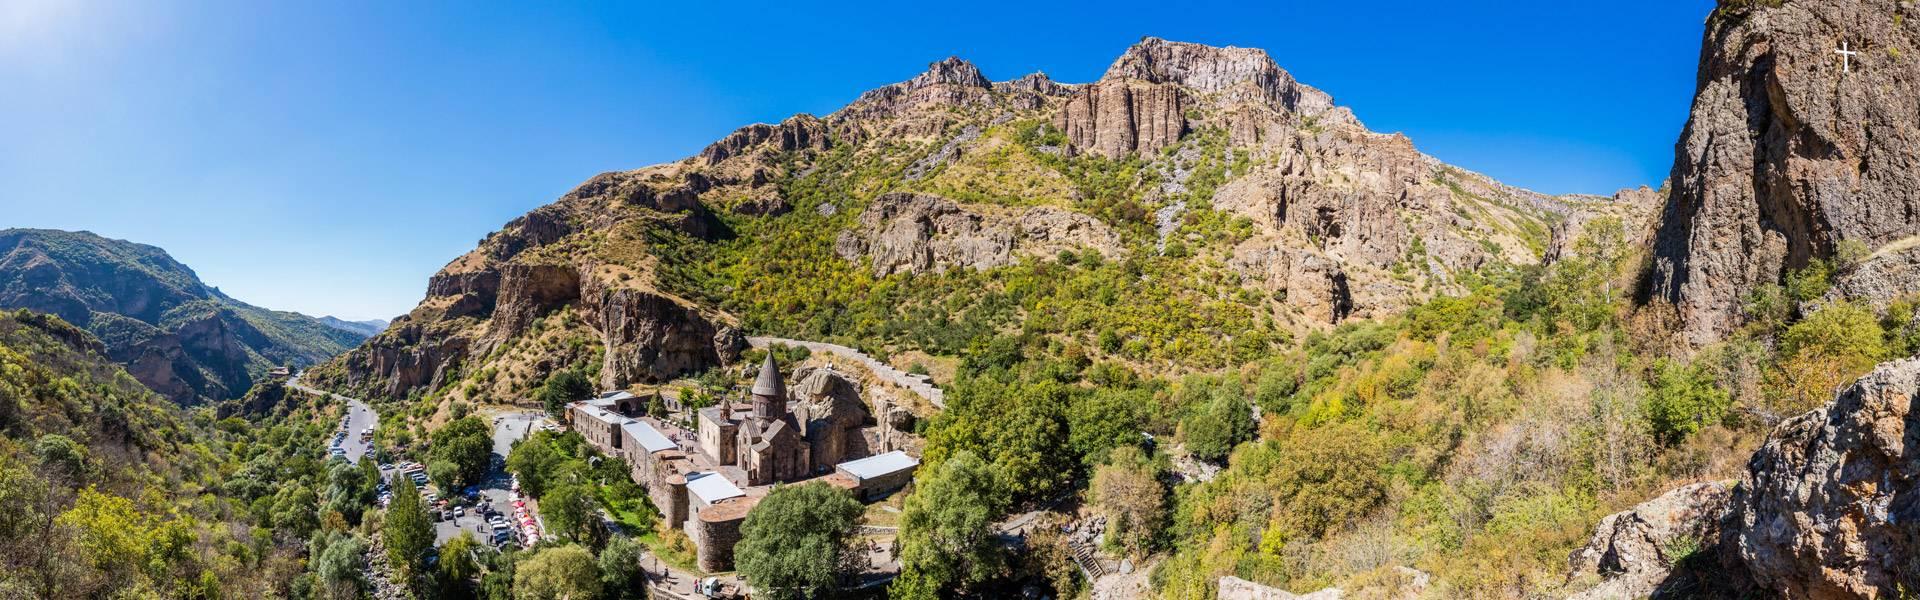 topo-geghard-armenia